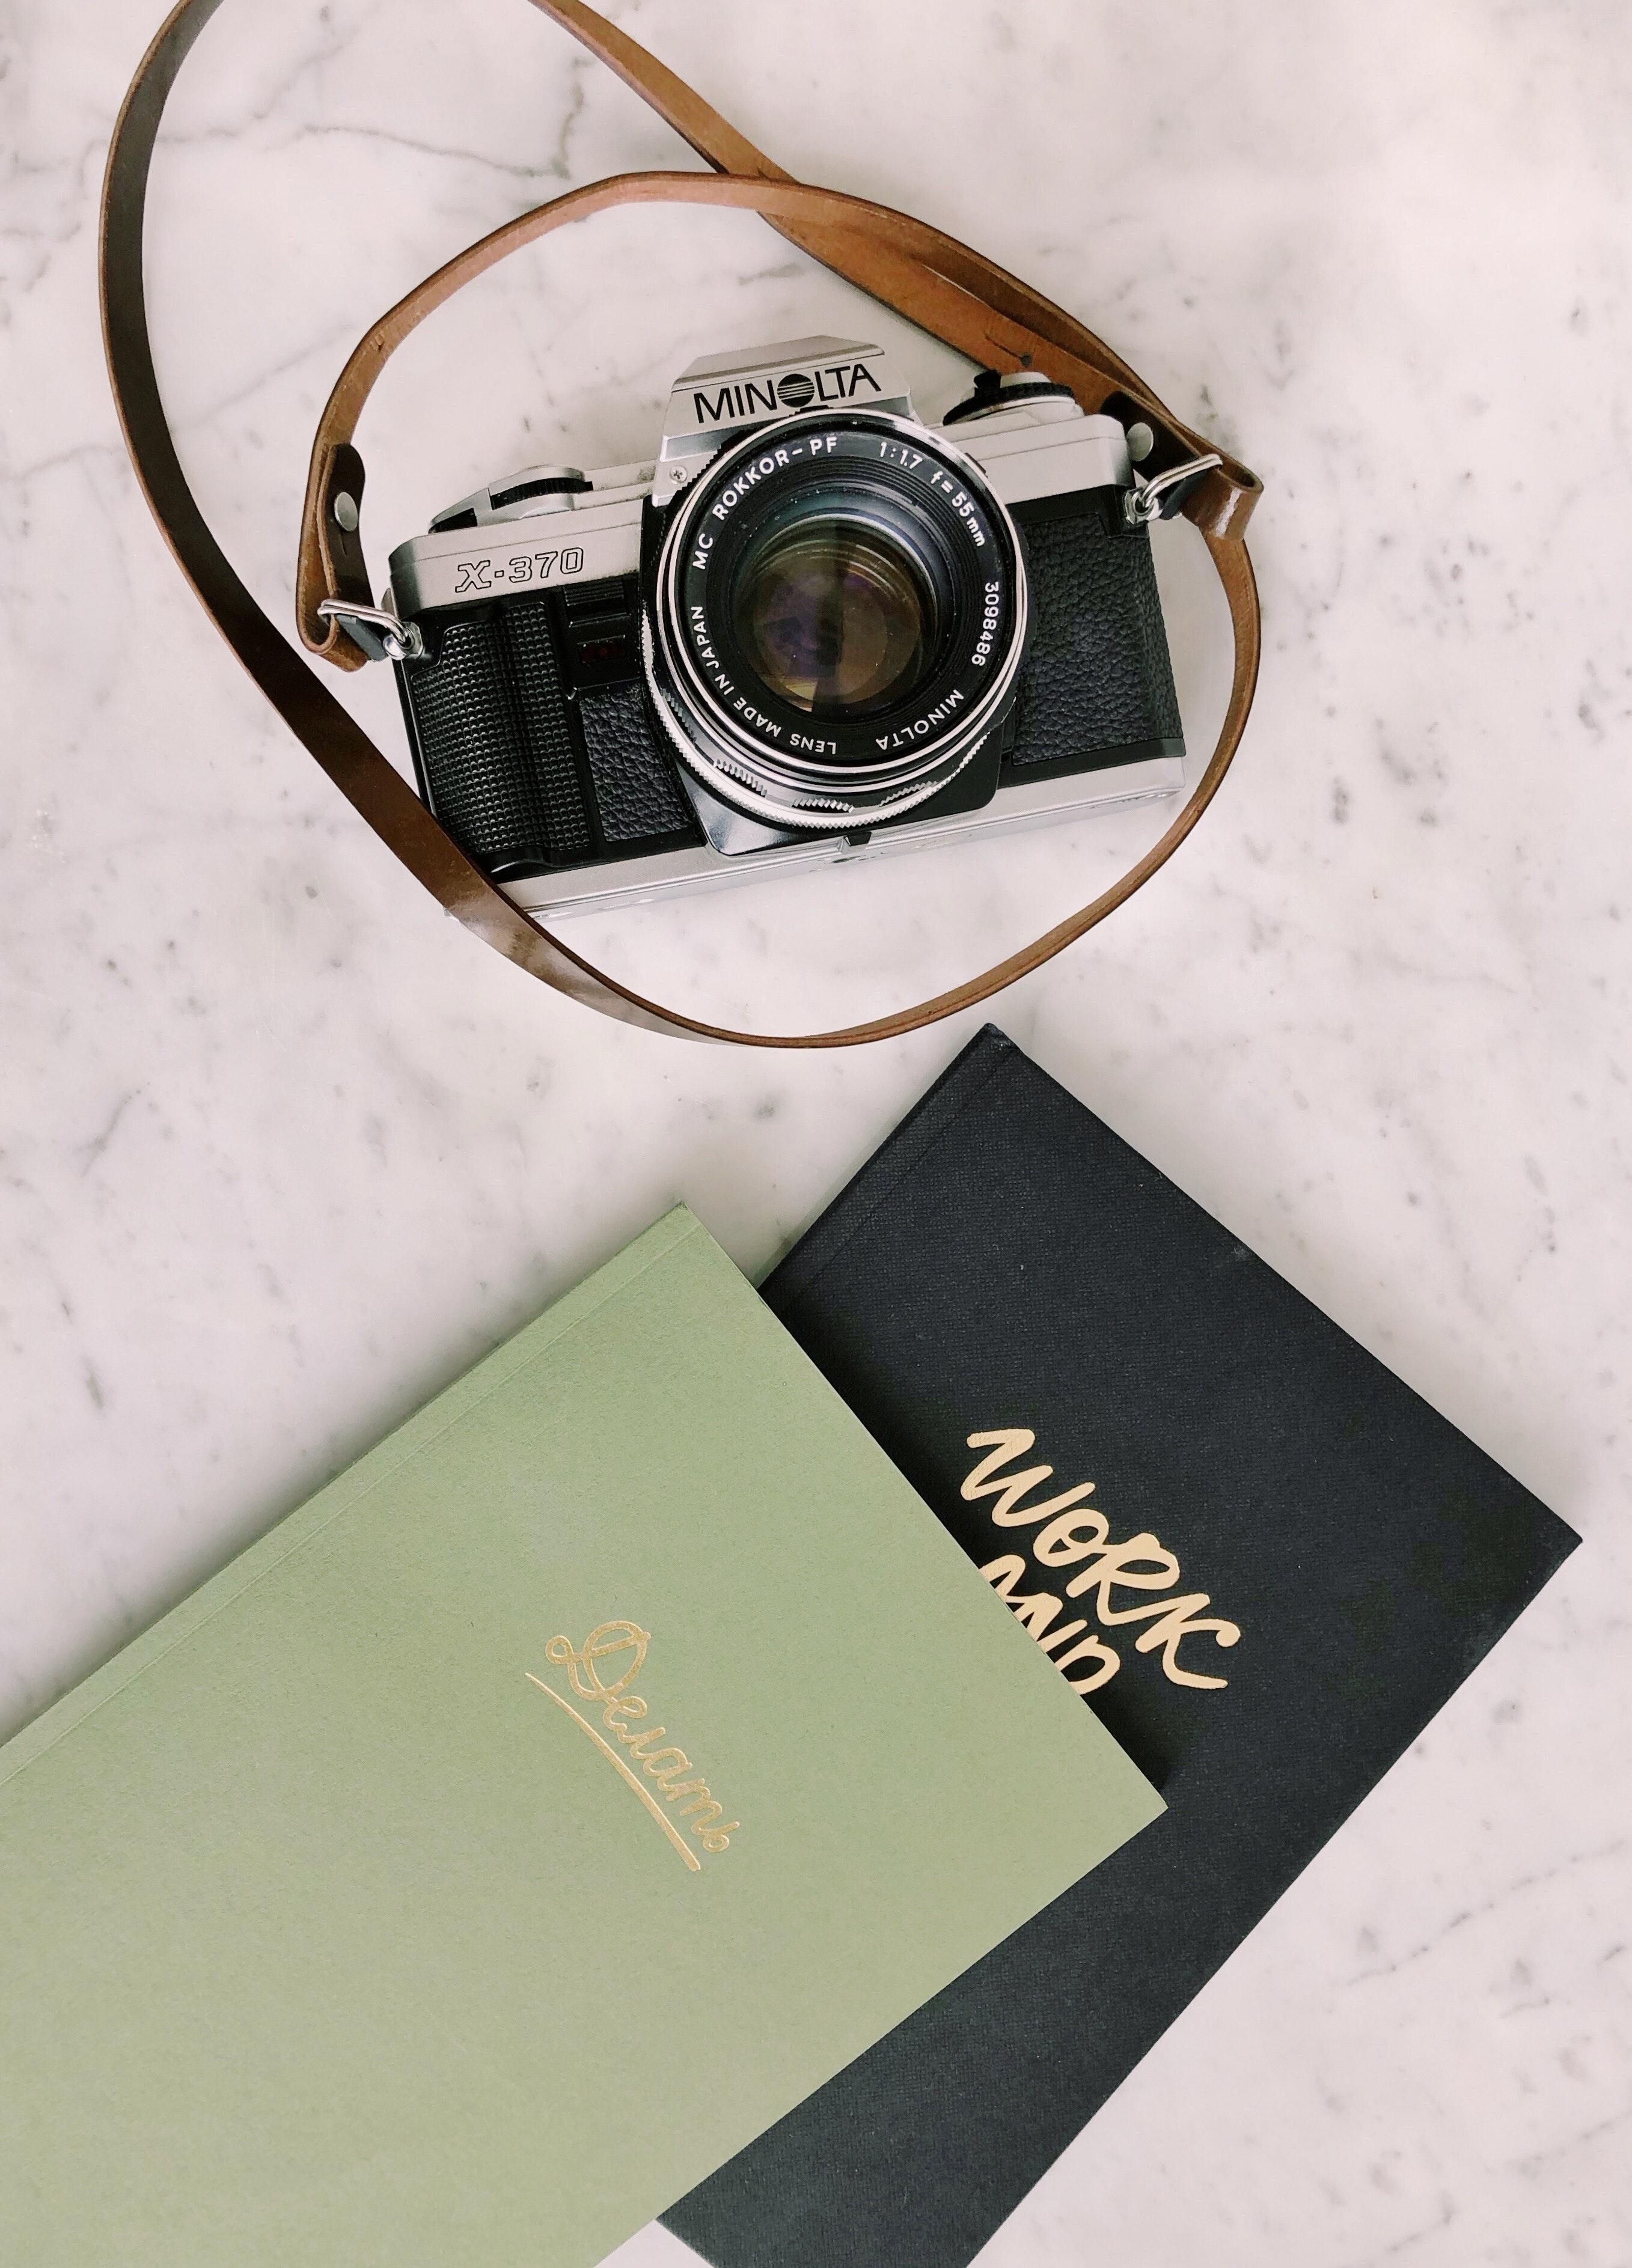 Black and Gray Minolta Milc Camera, Black, Books, Camera, Close-up, HQ Photo